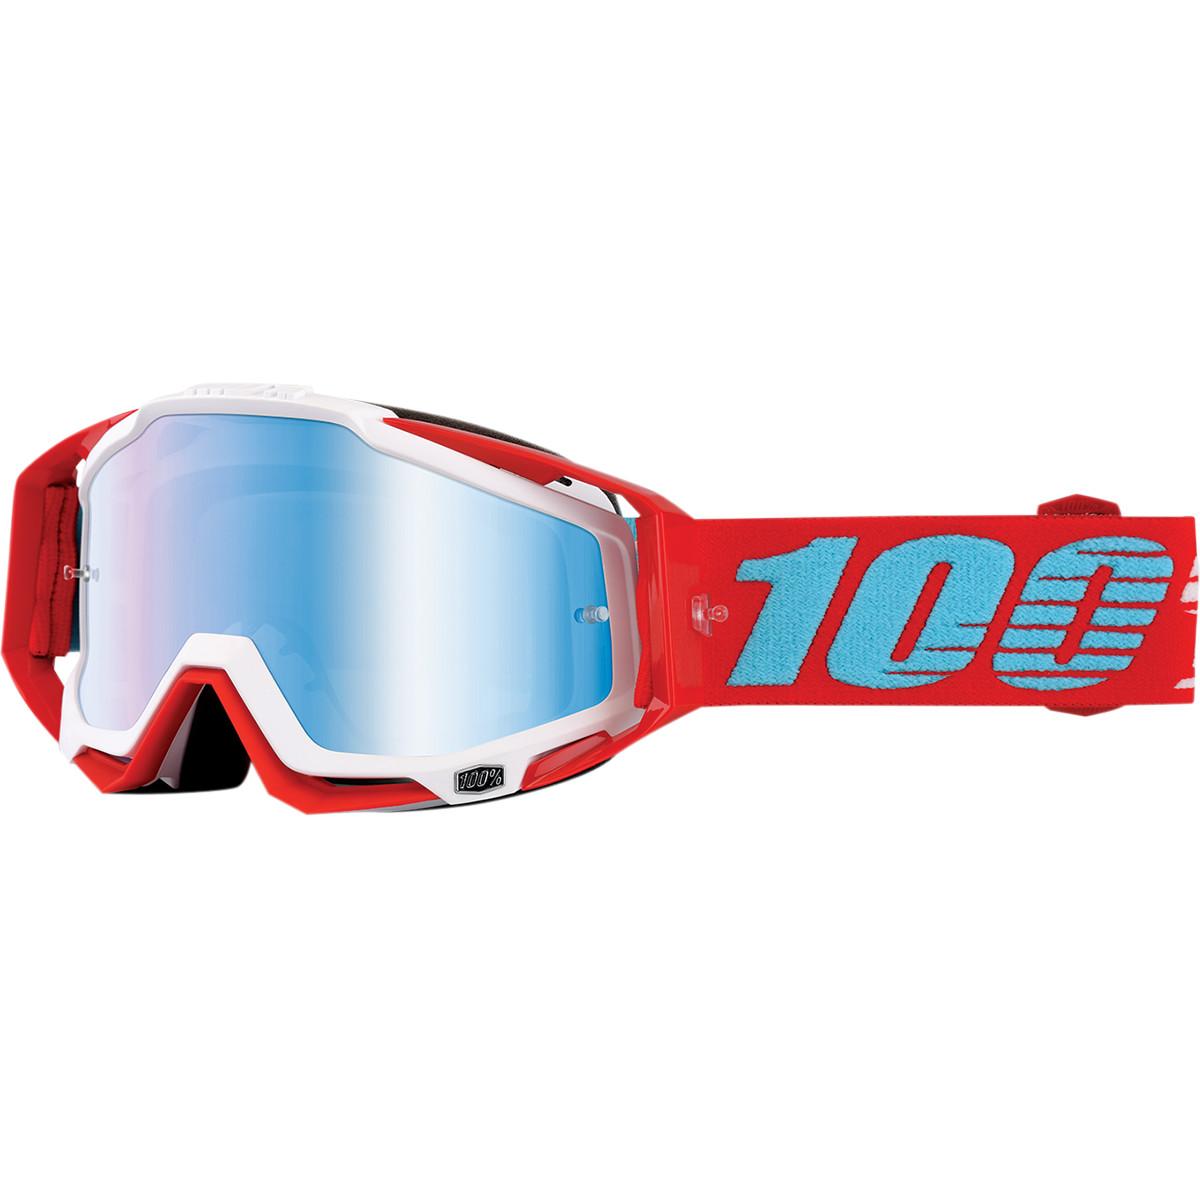 racecraft goggles [2601-2137] 1